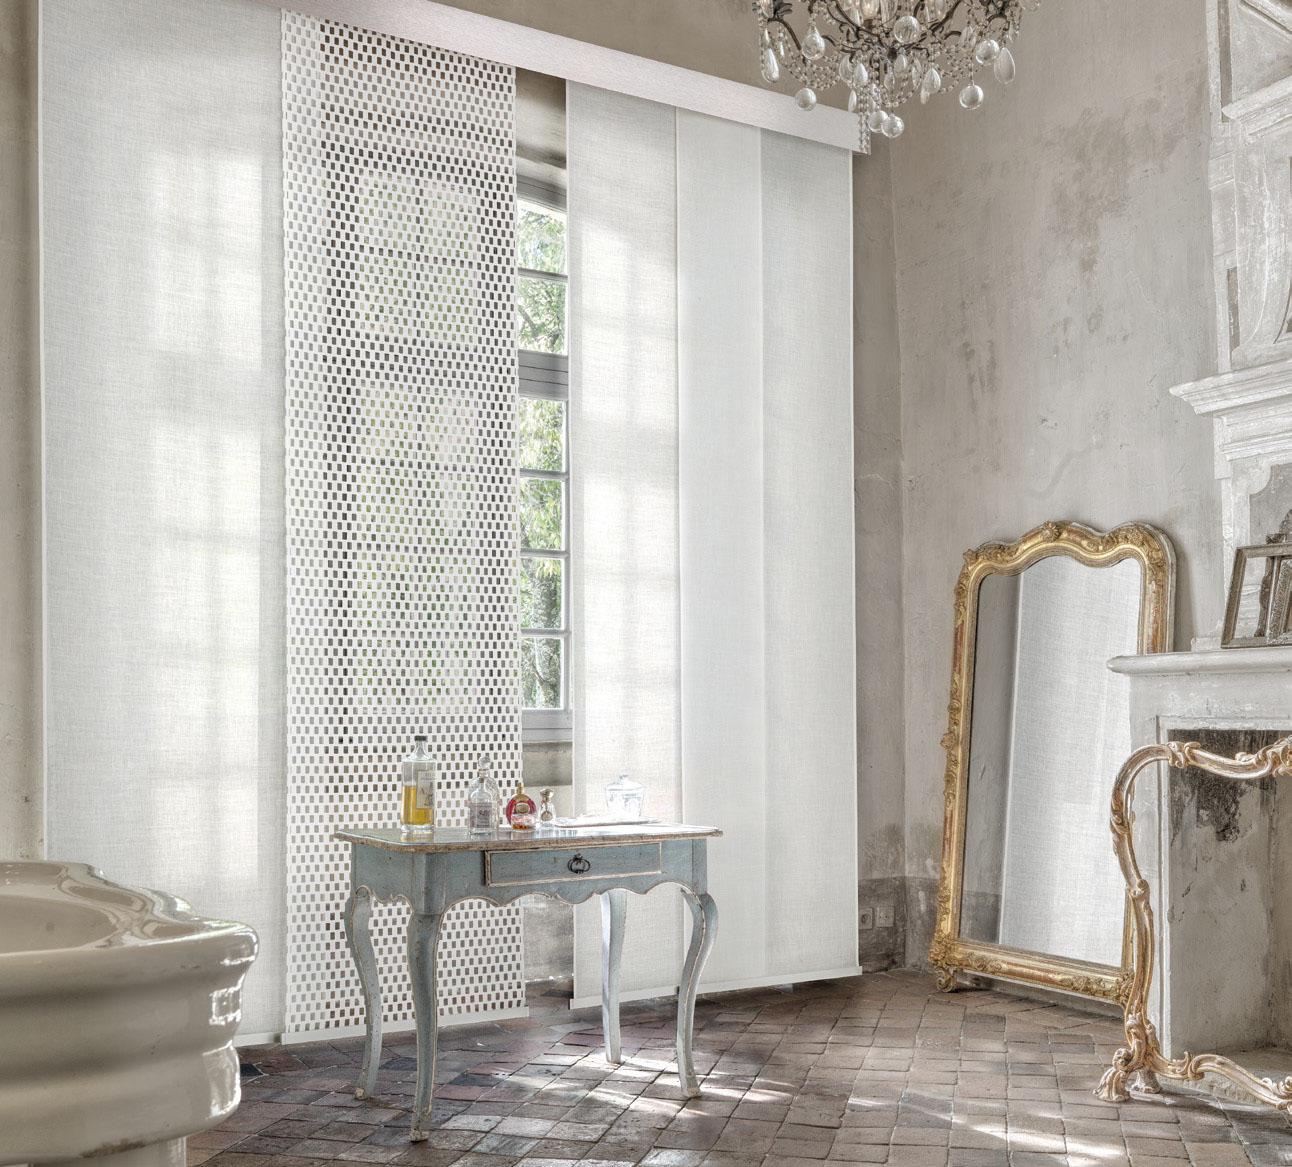 Great casa moderna interno pittura per interni moderna for Pittura per interni moderne